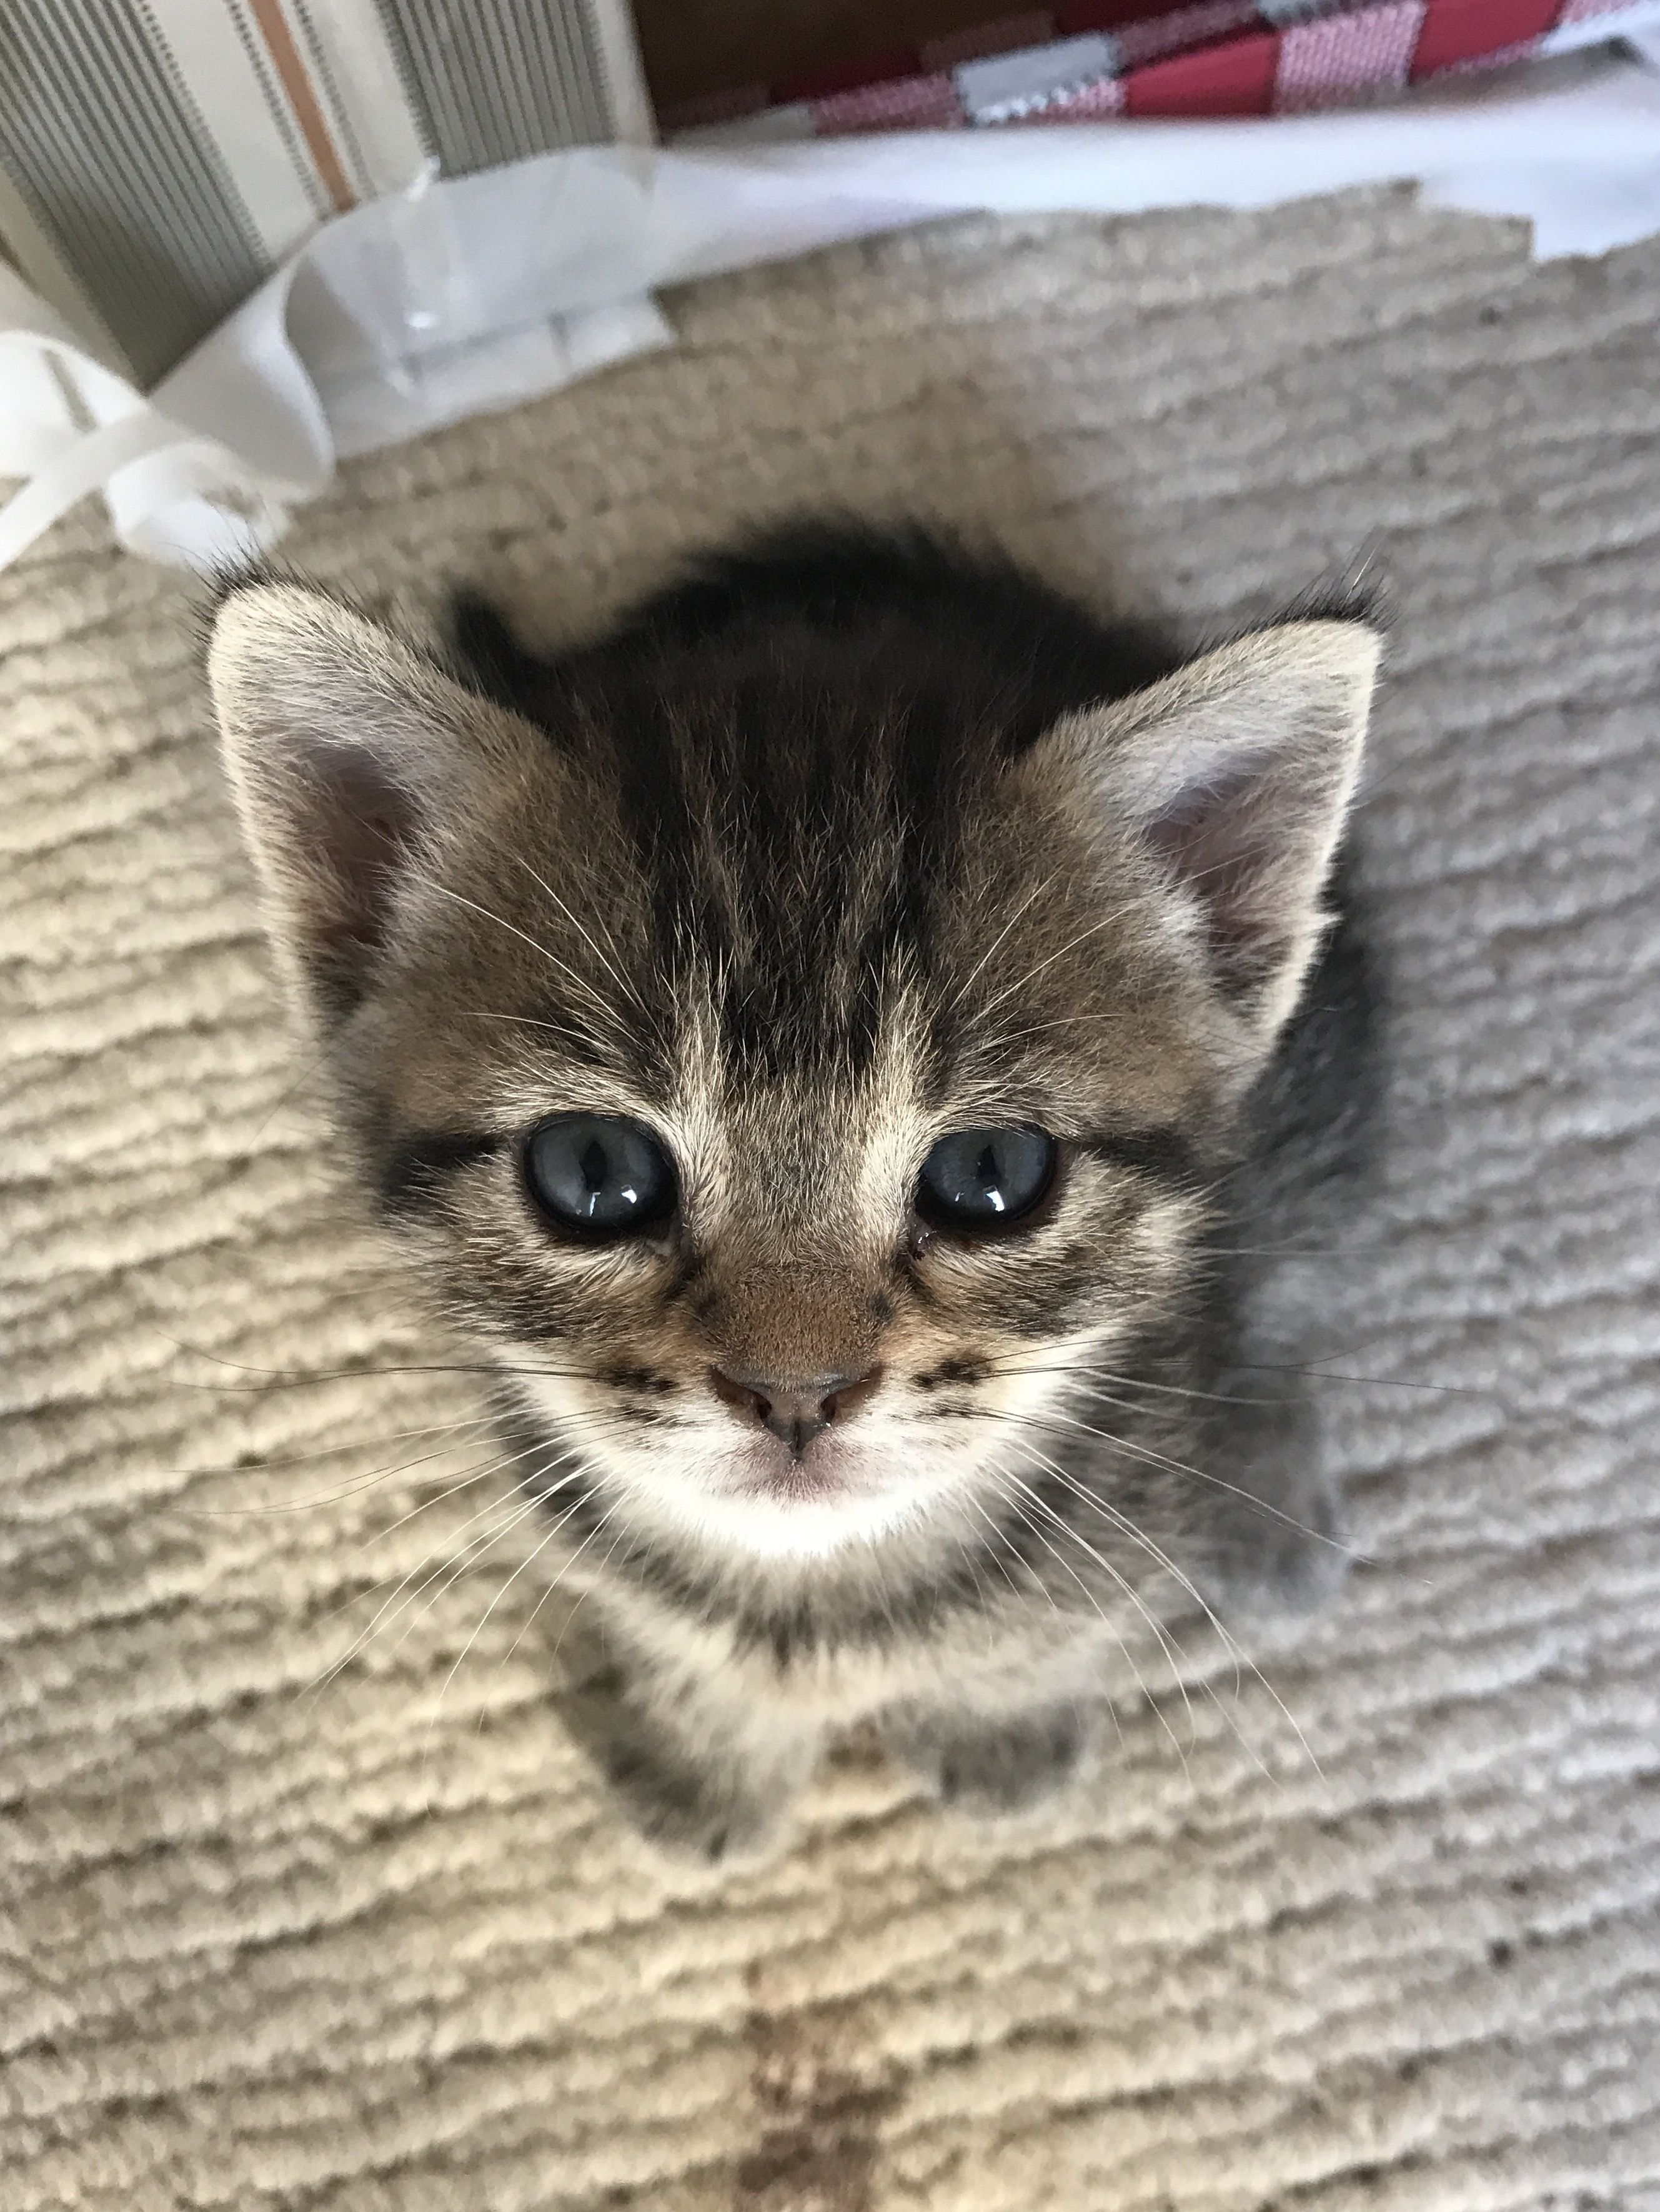 The little cutiest kitten babyanimal cuteanimal 135